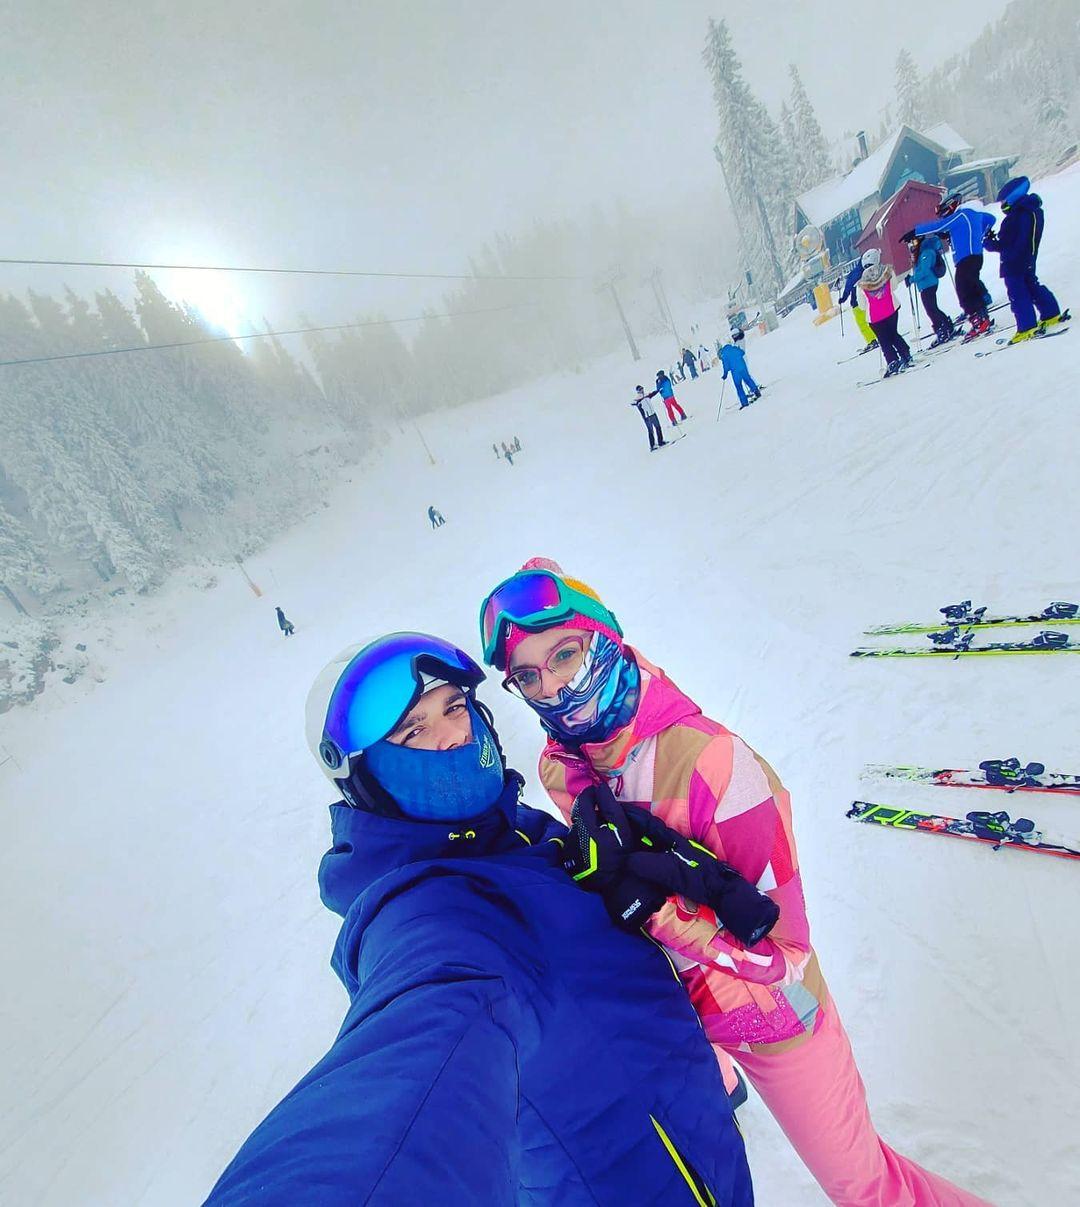 wisata traveling winter jahorina bosnia